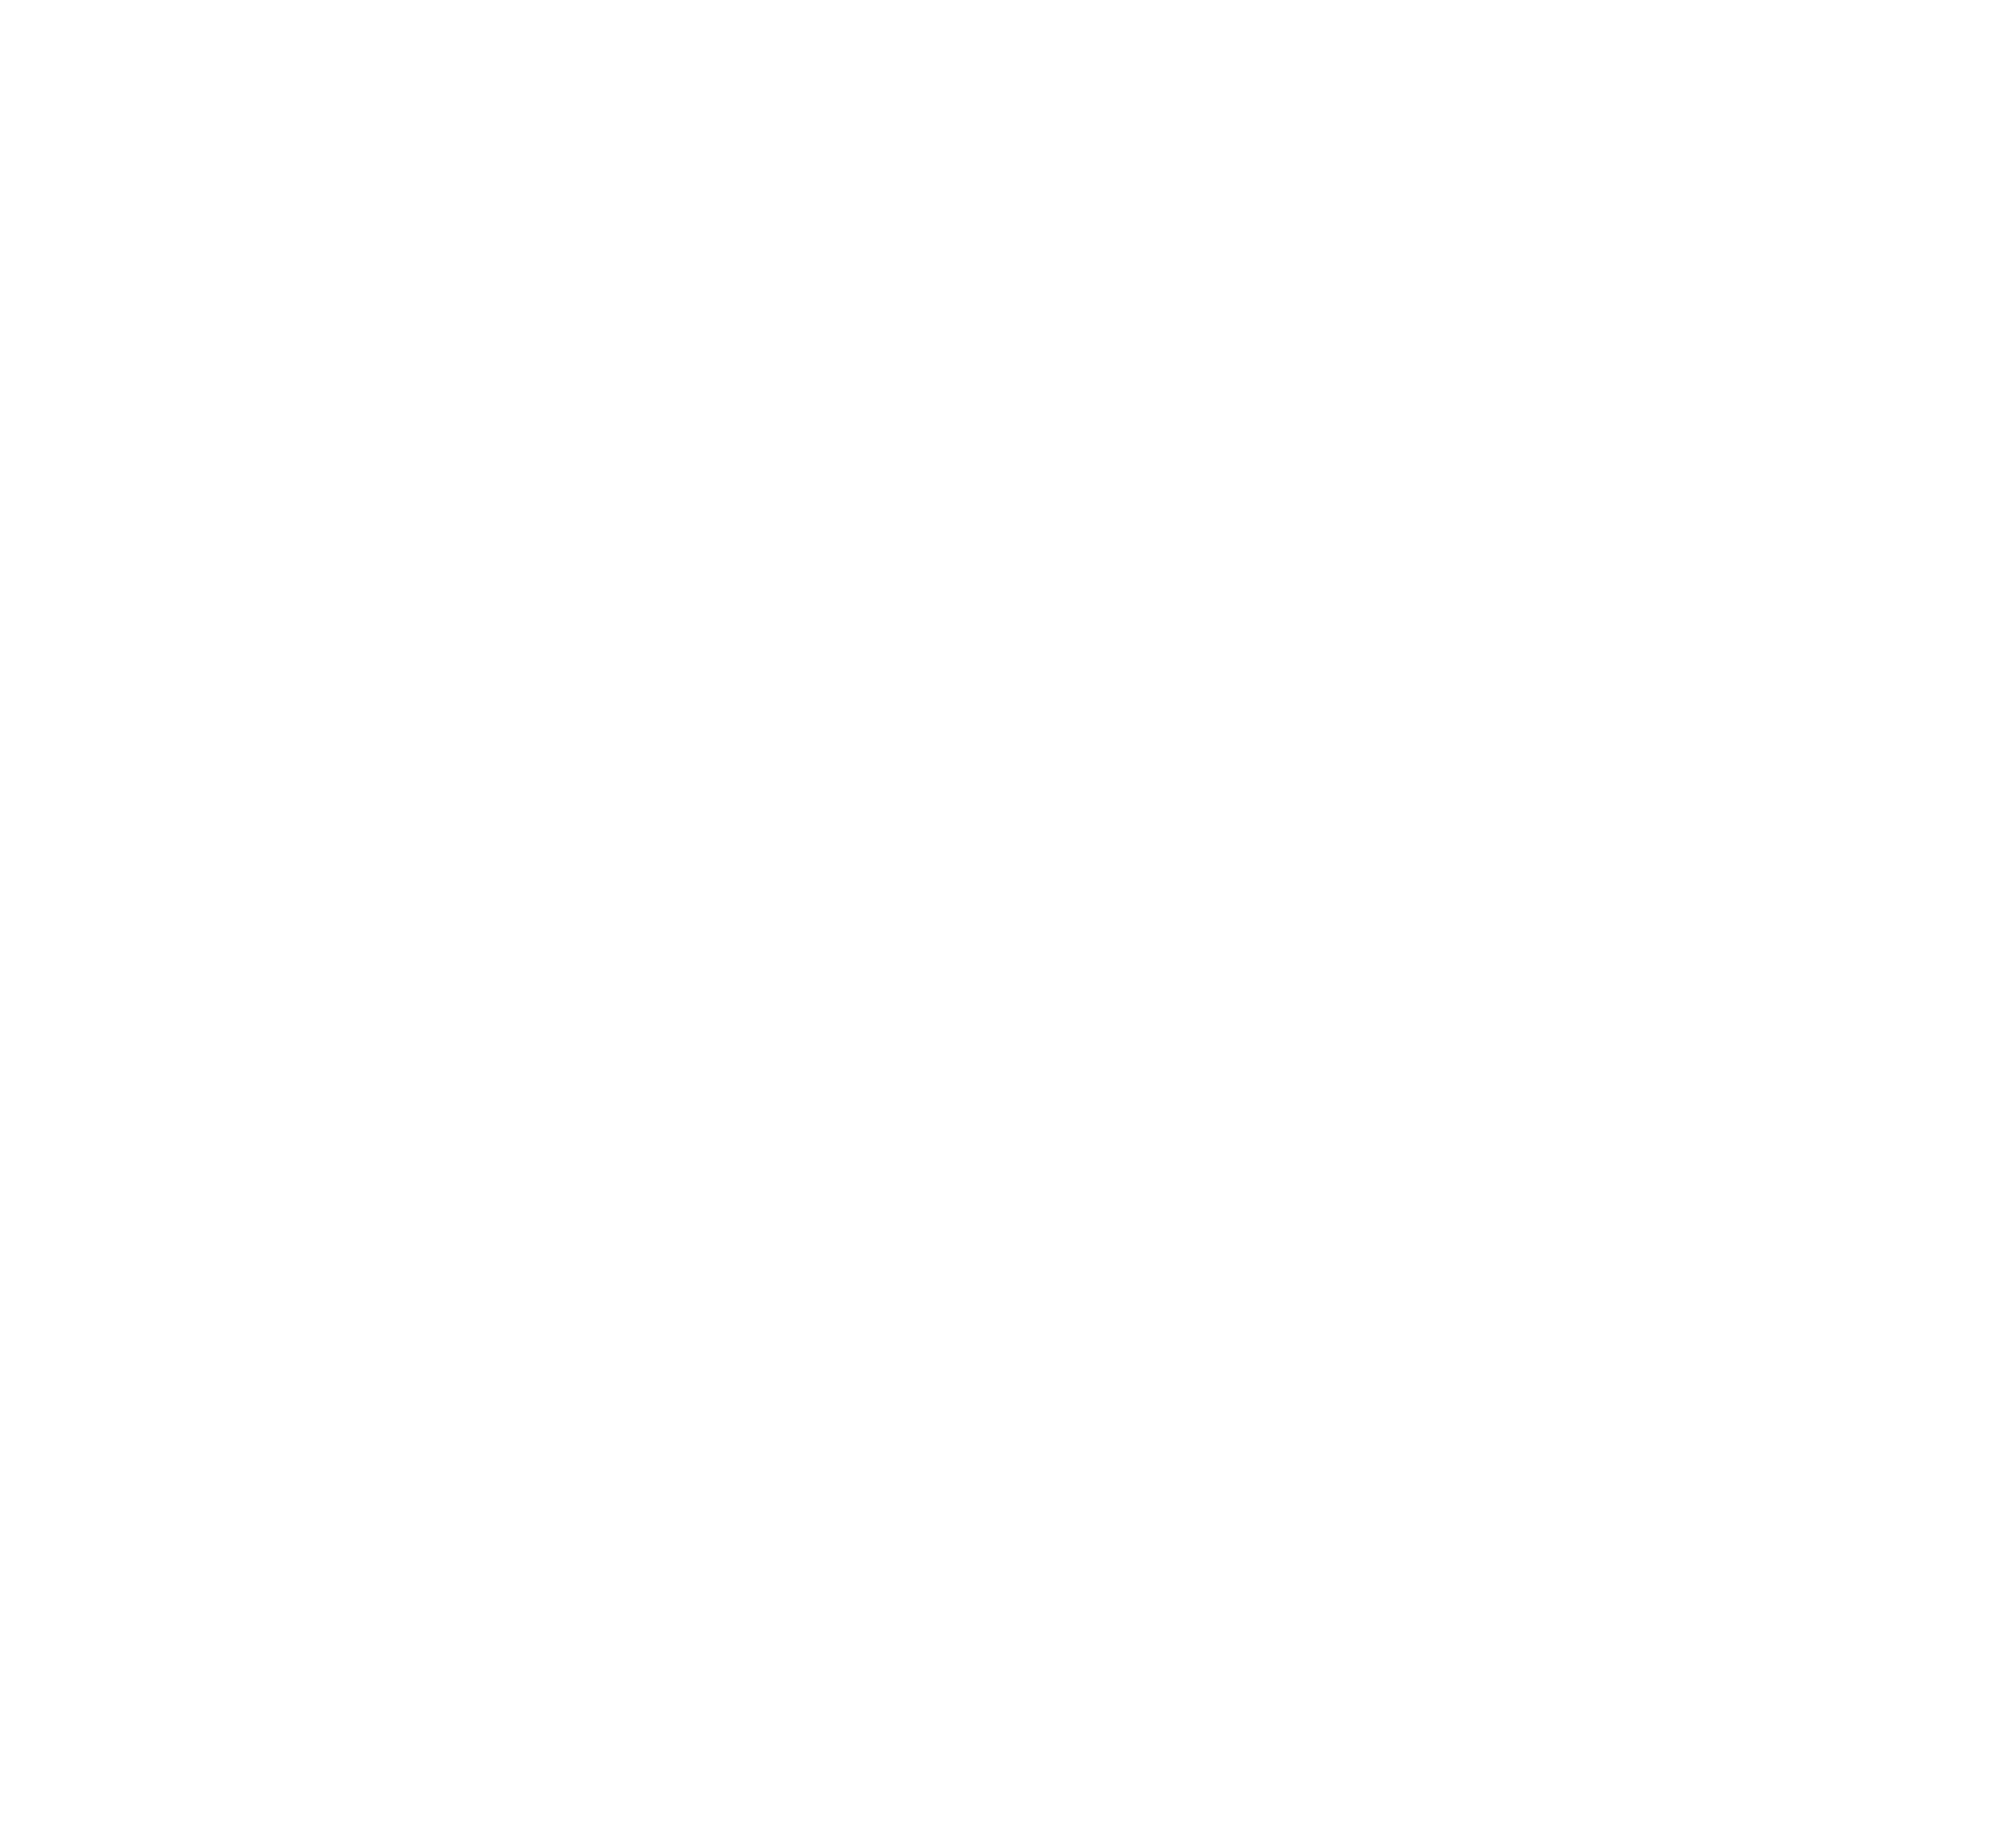 ALPFA UCF